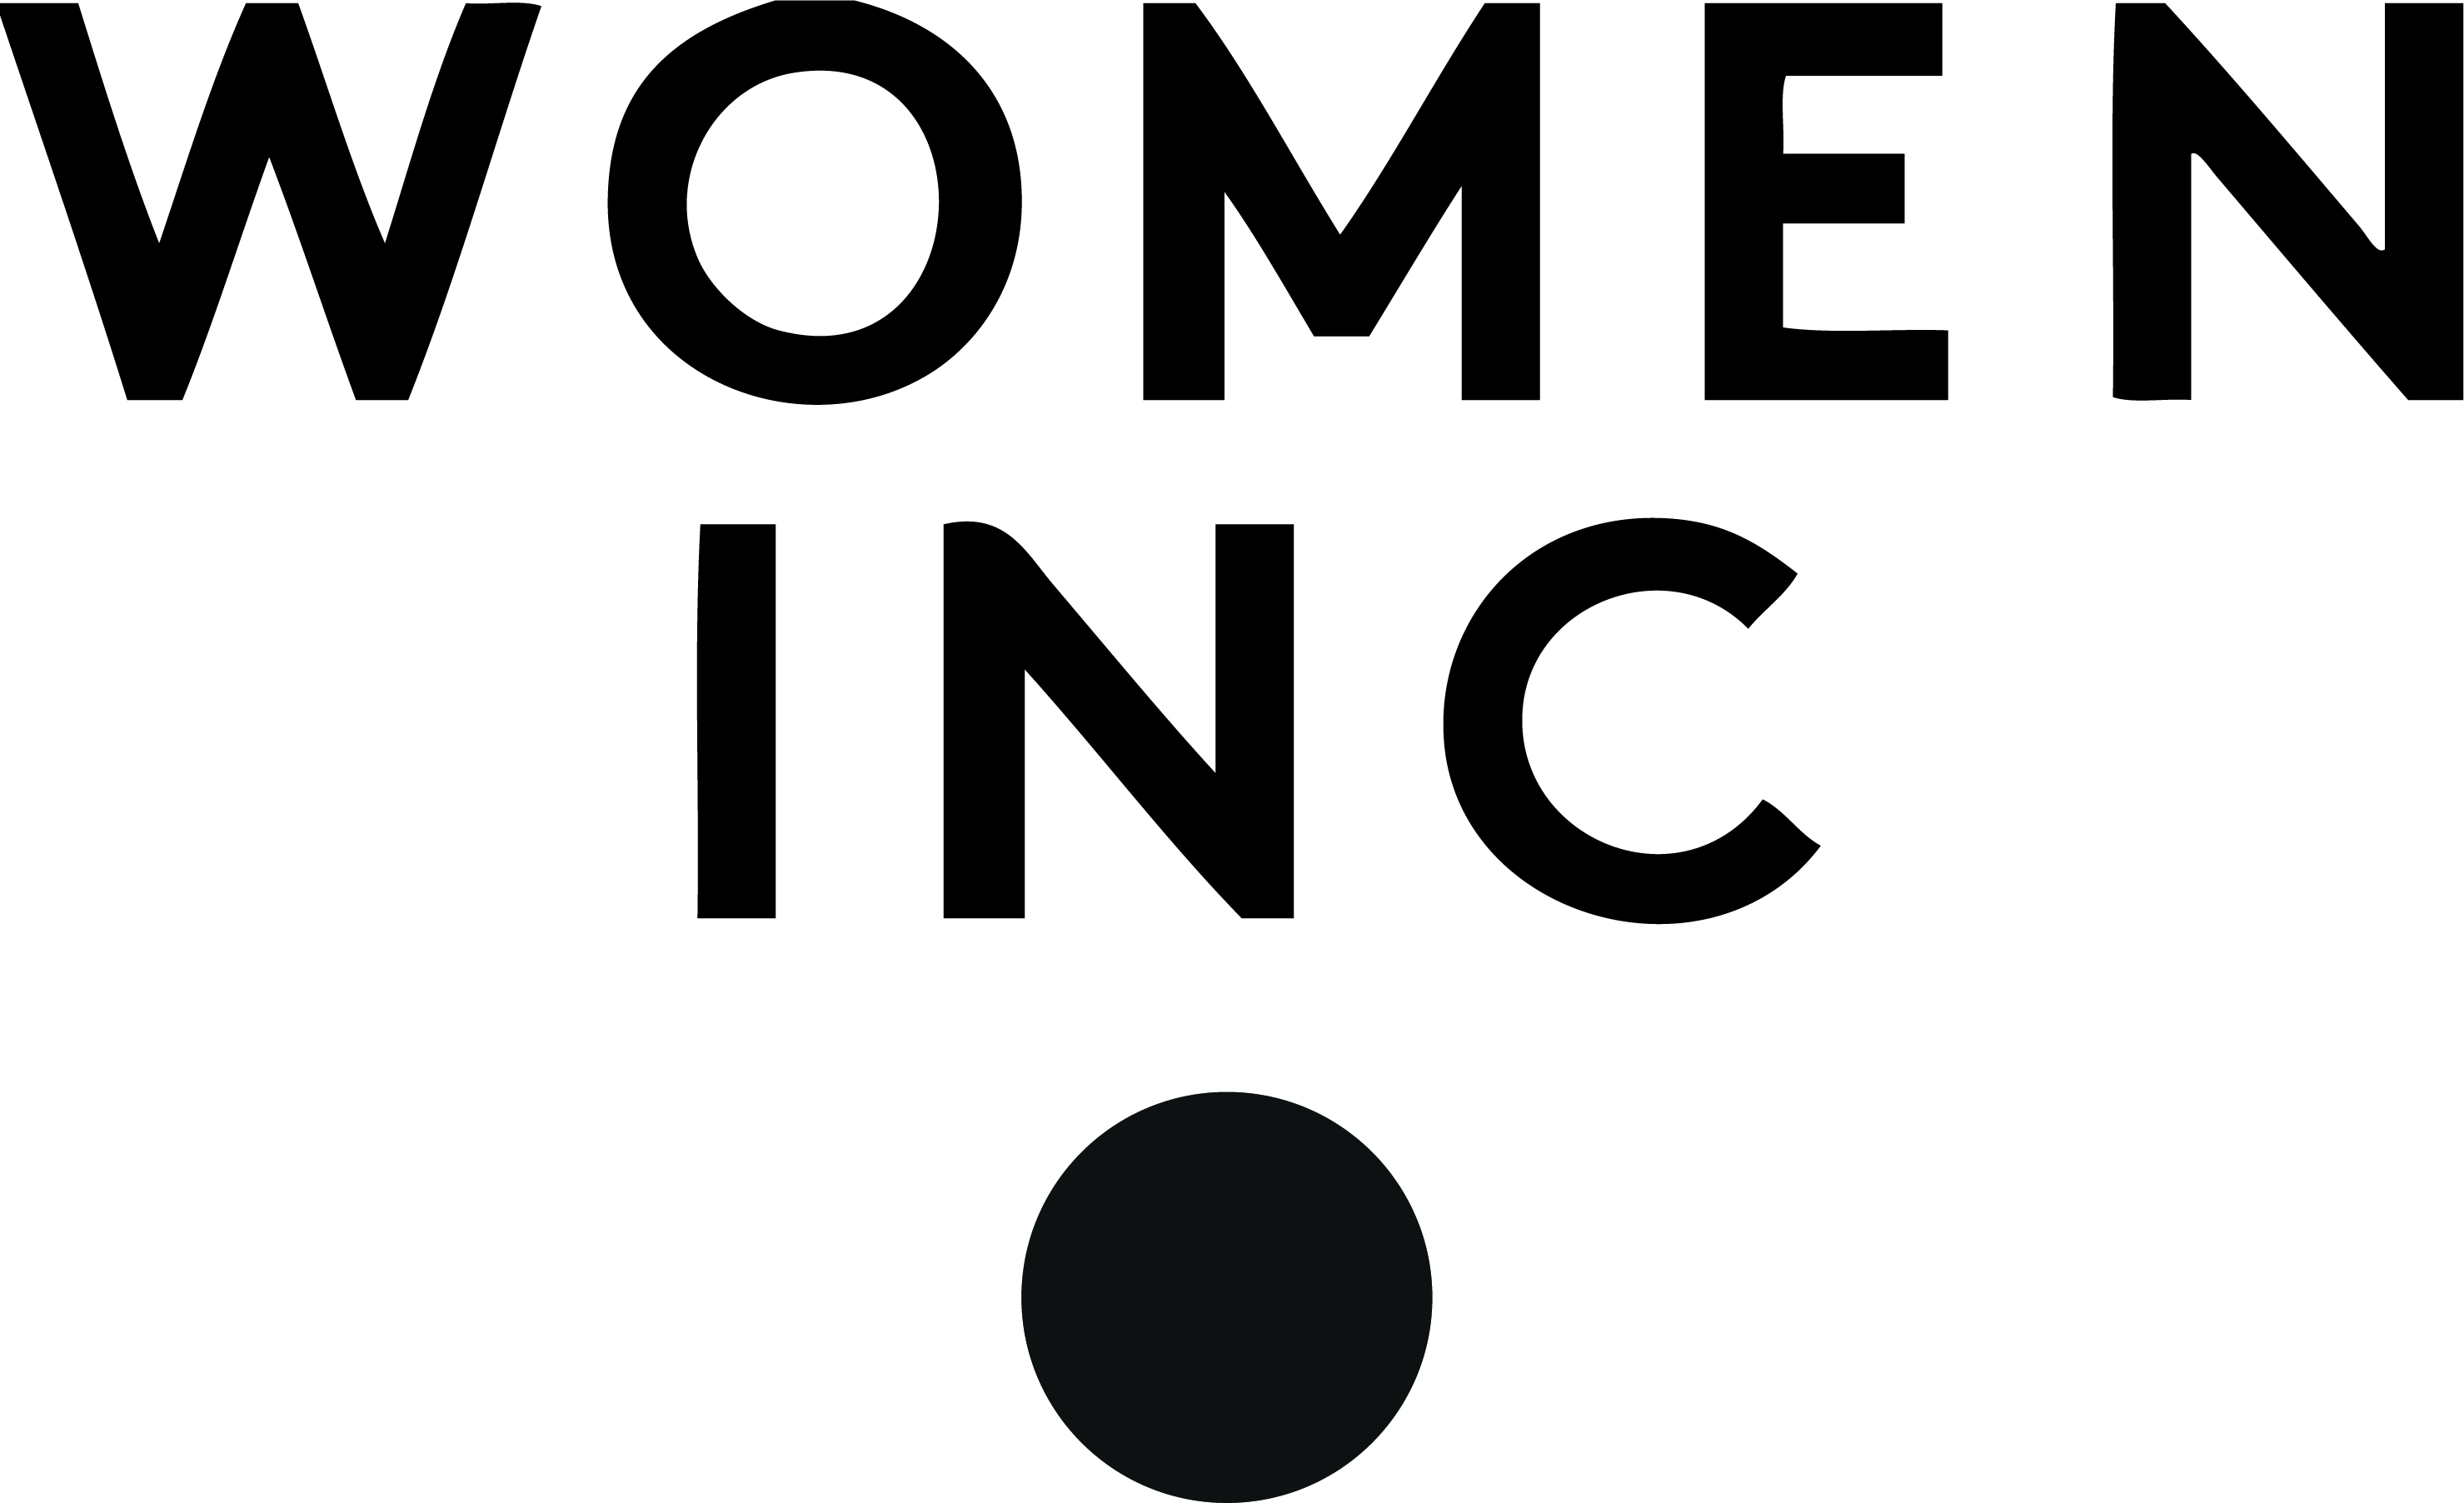 WOMEN Inc. logo